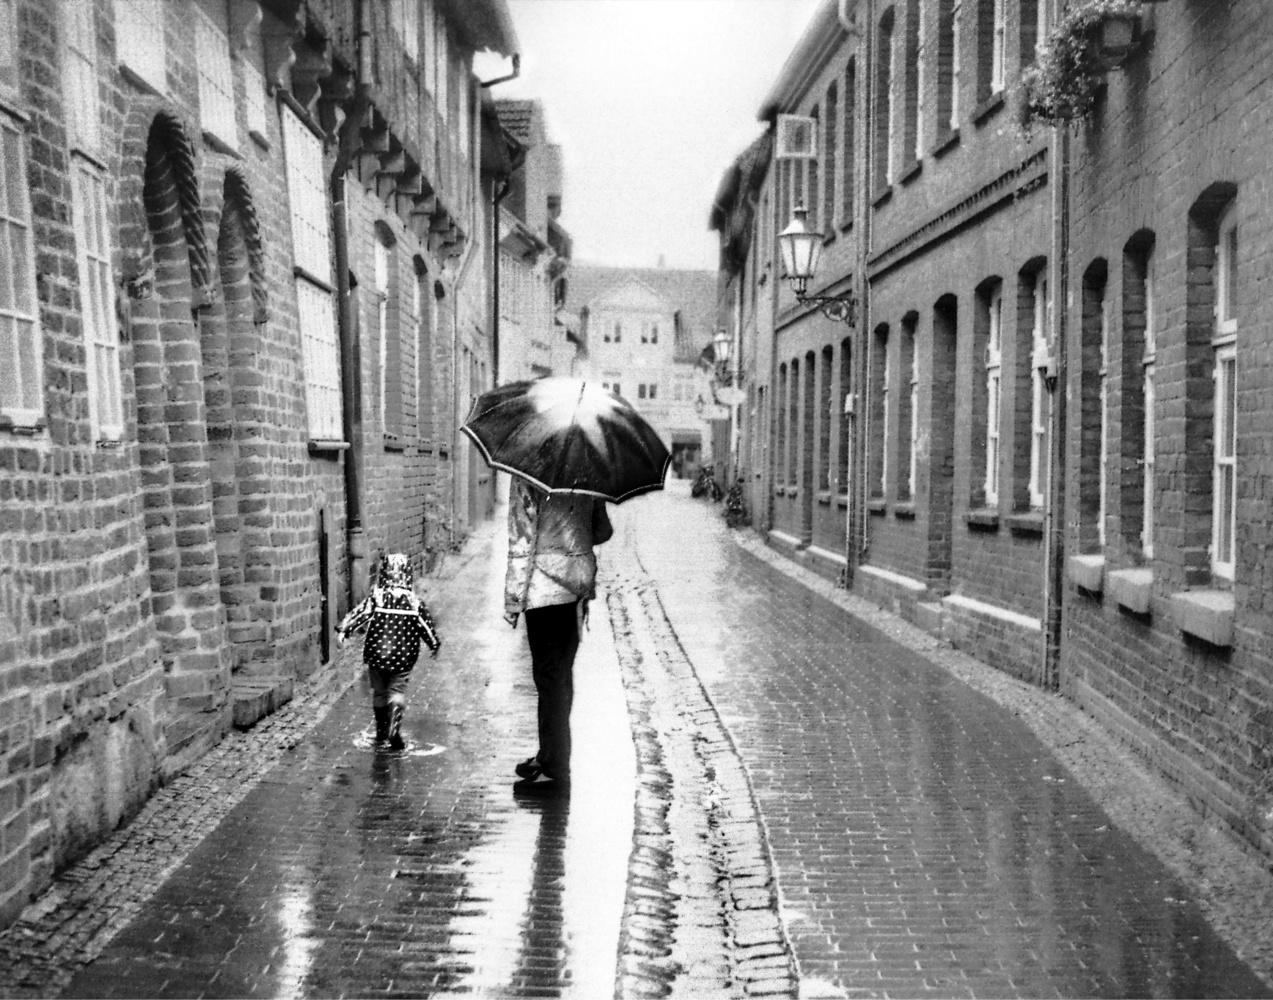 Singing in the Rain by Rasti Konkol